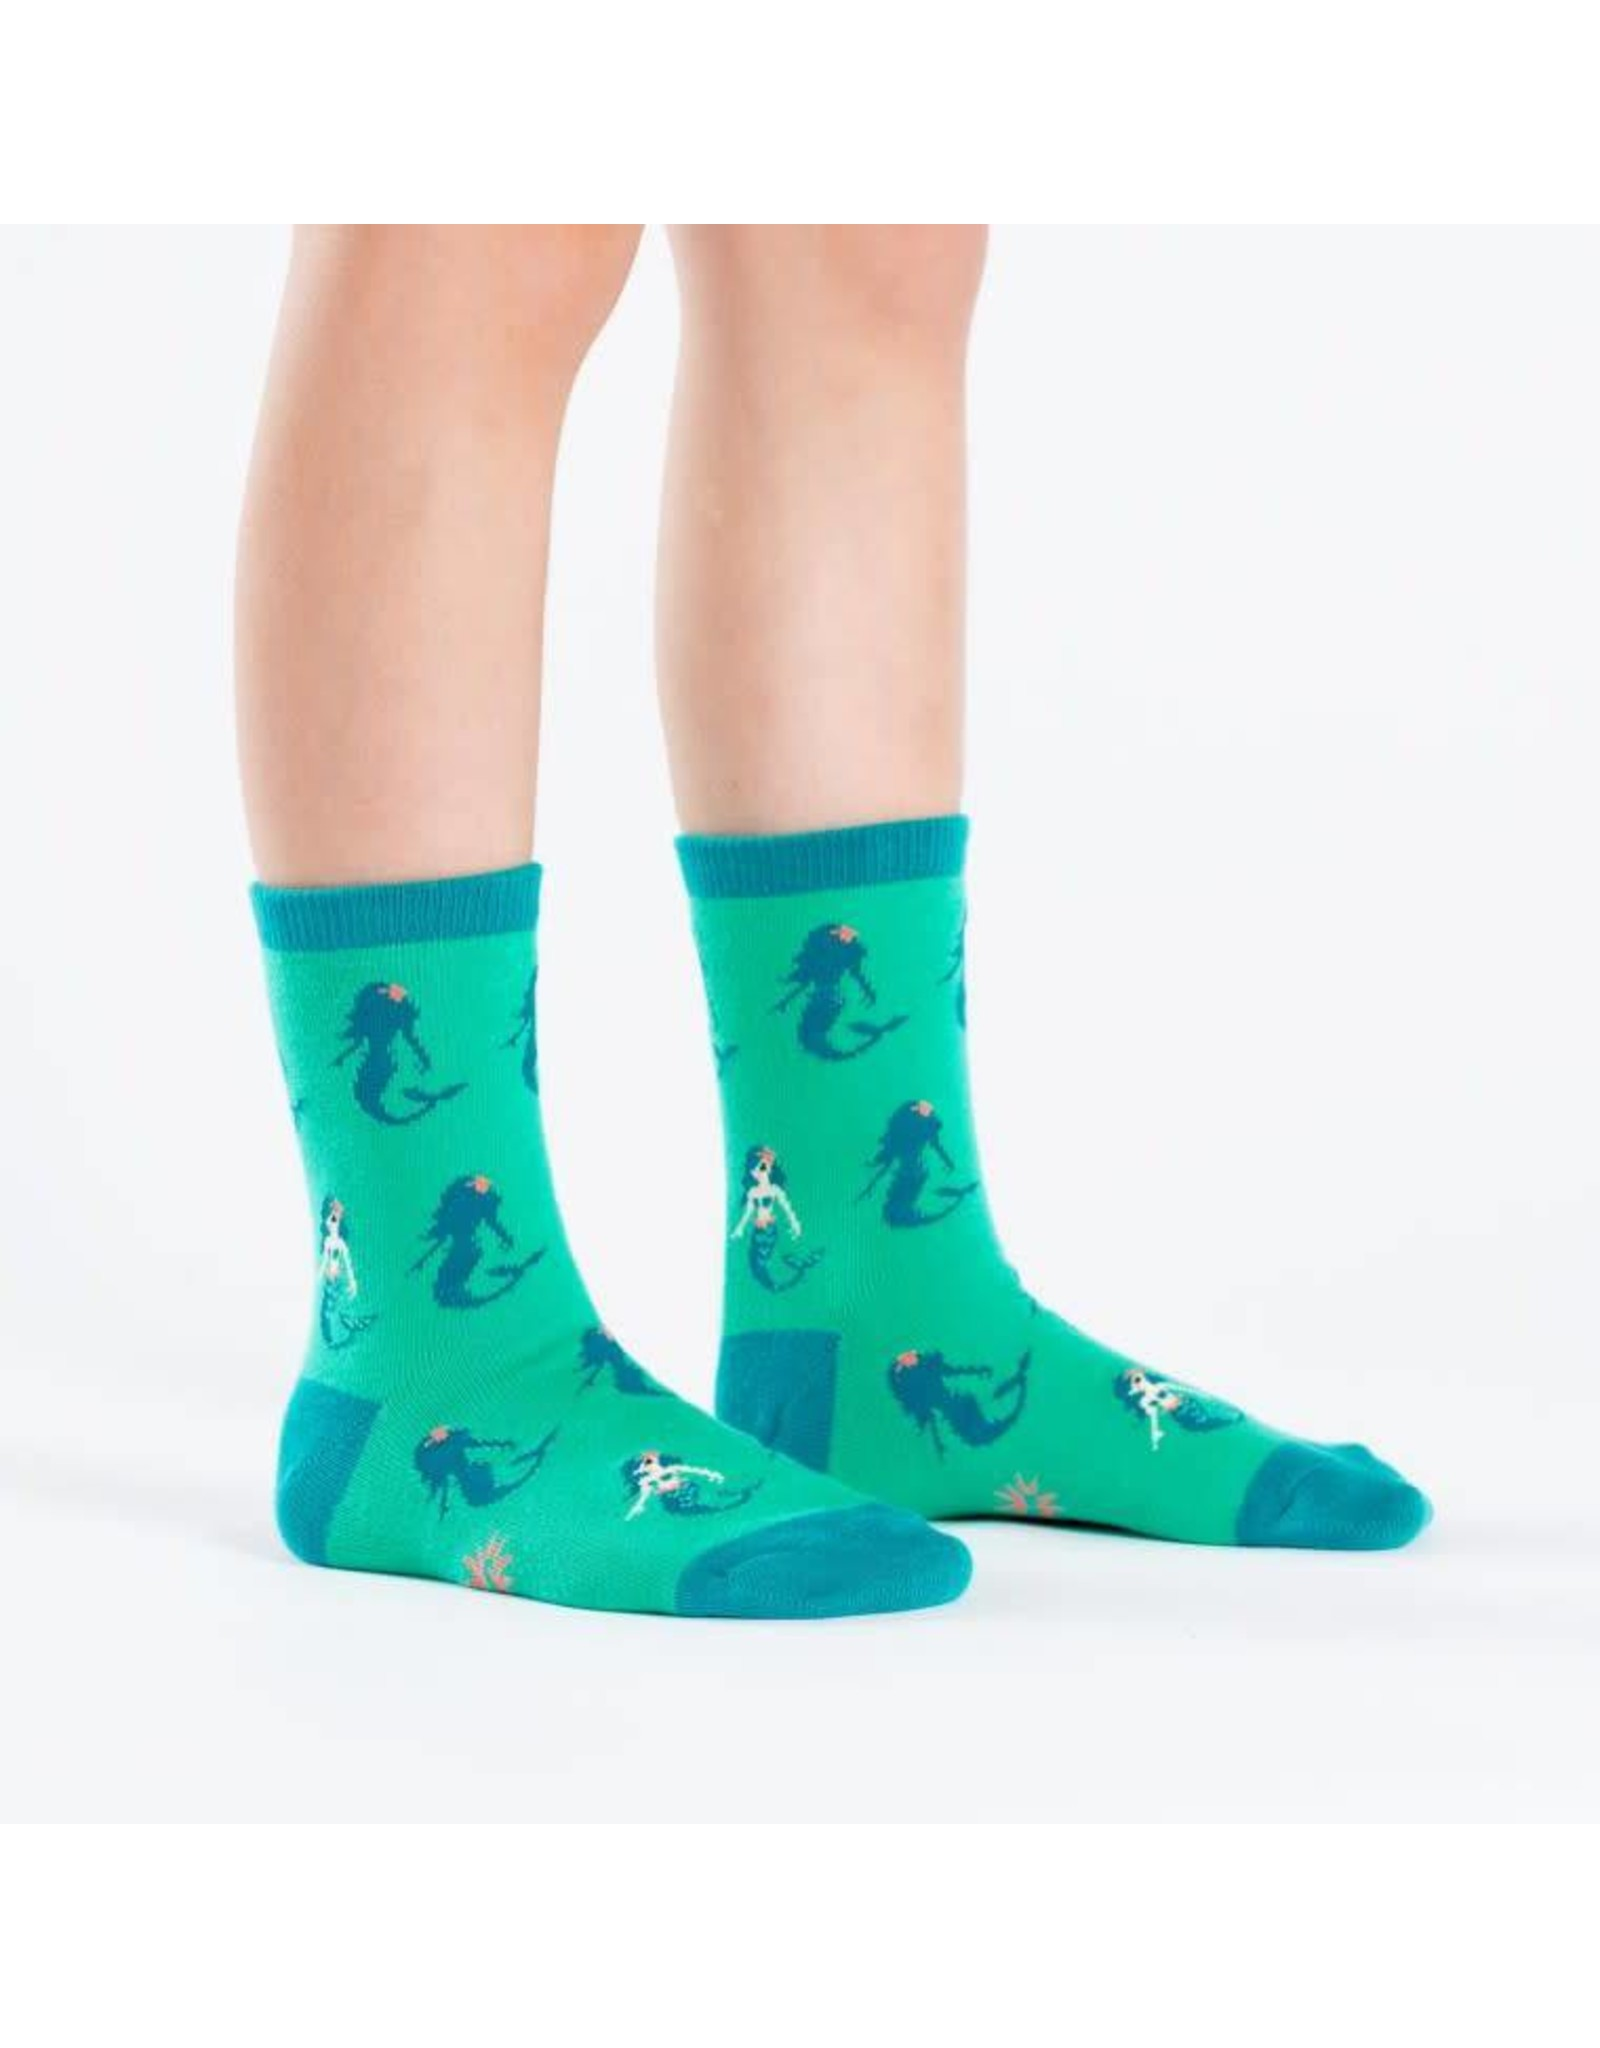 SOCK IT TO ME - Youth Princess of The Sea Crew Socks